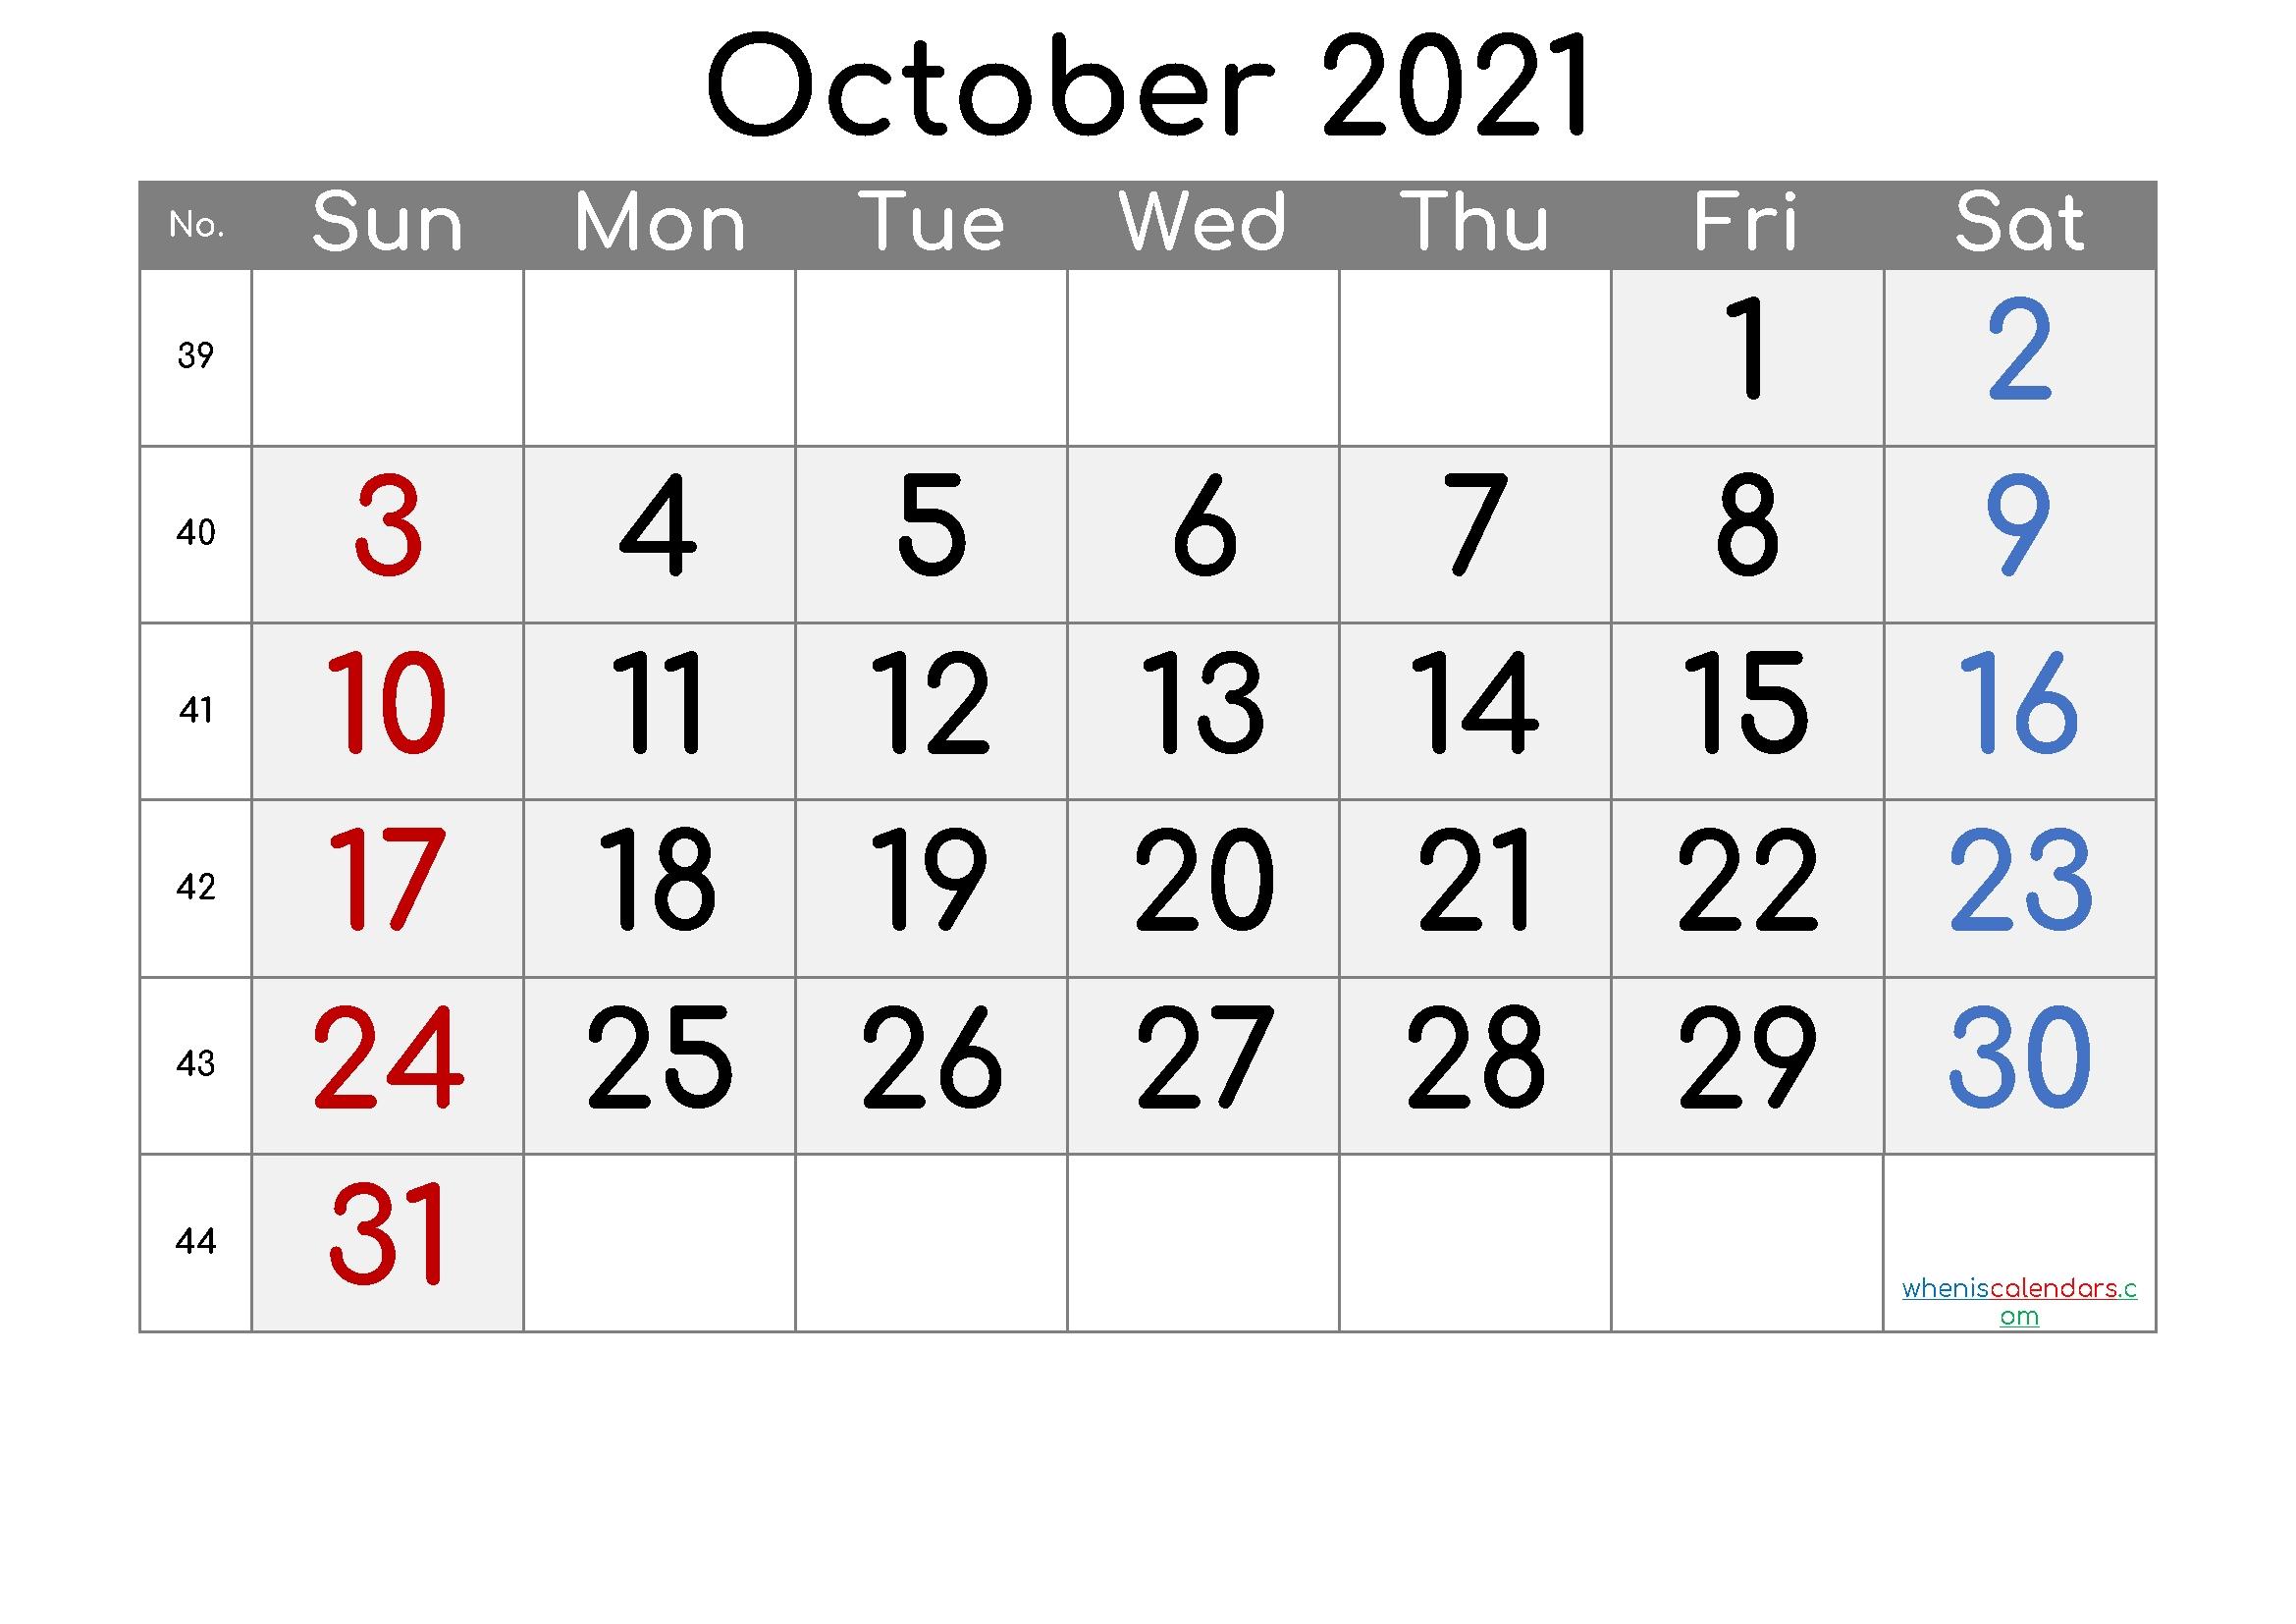 2021 October Free Printable Calendar - 6 Templates October 2021 Calendar Cute